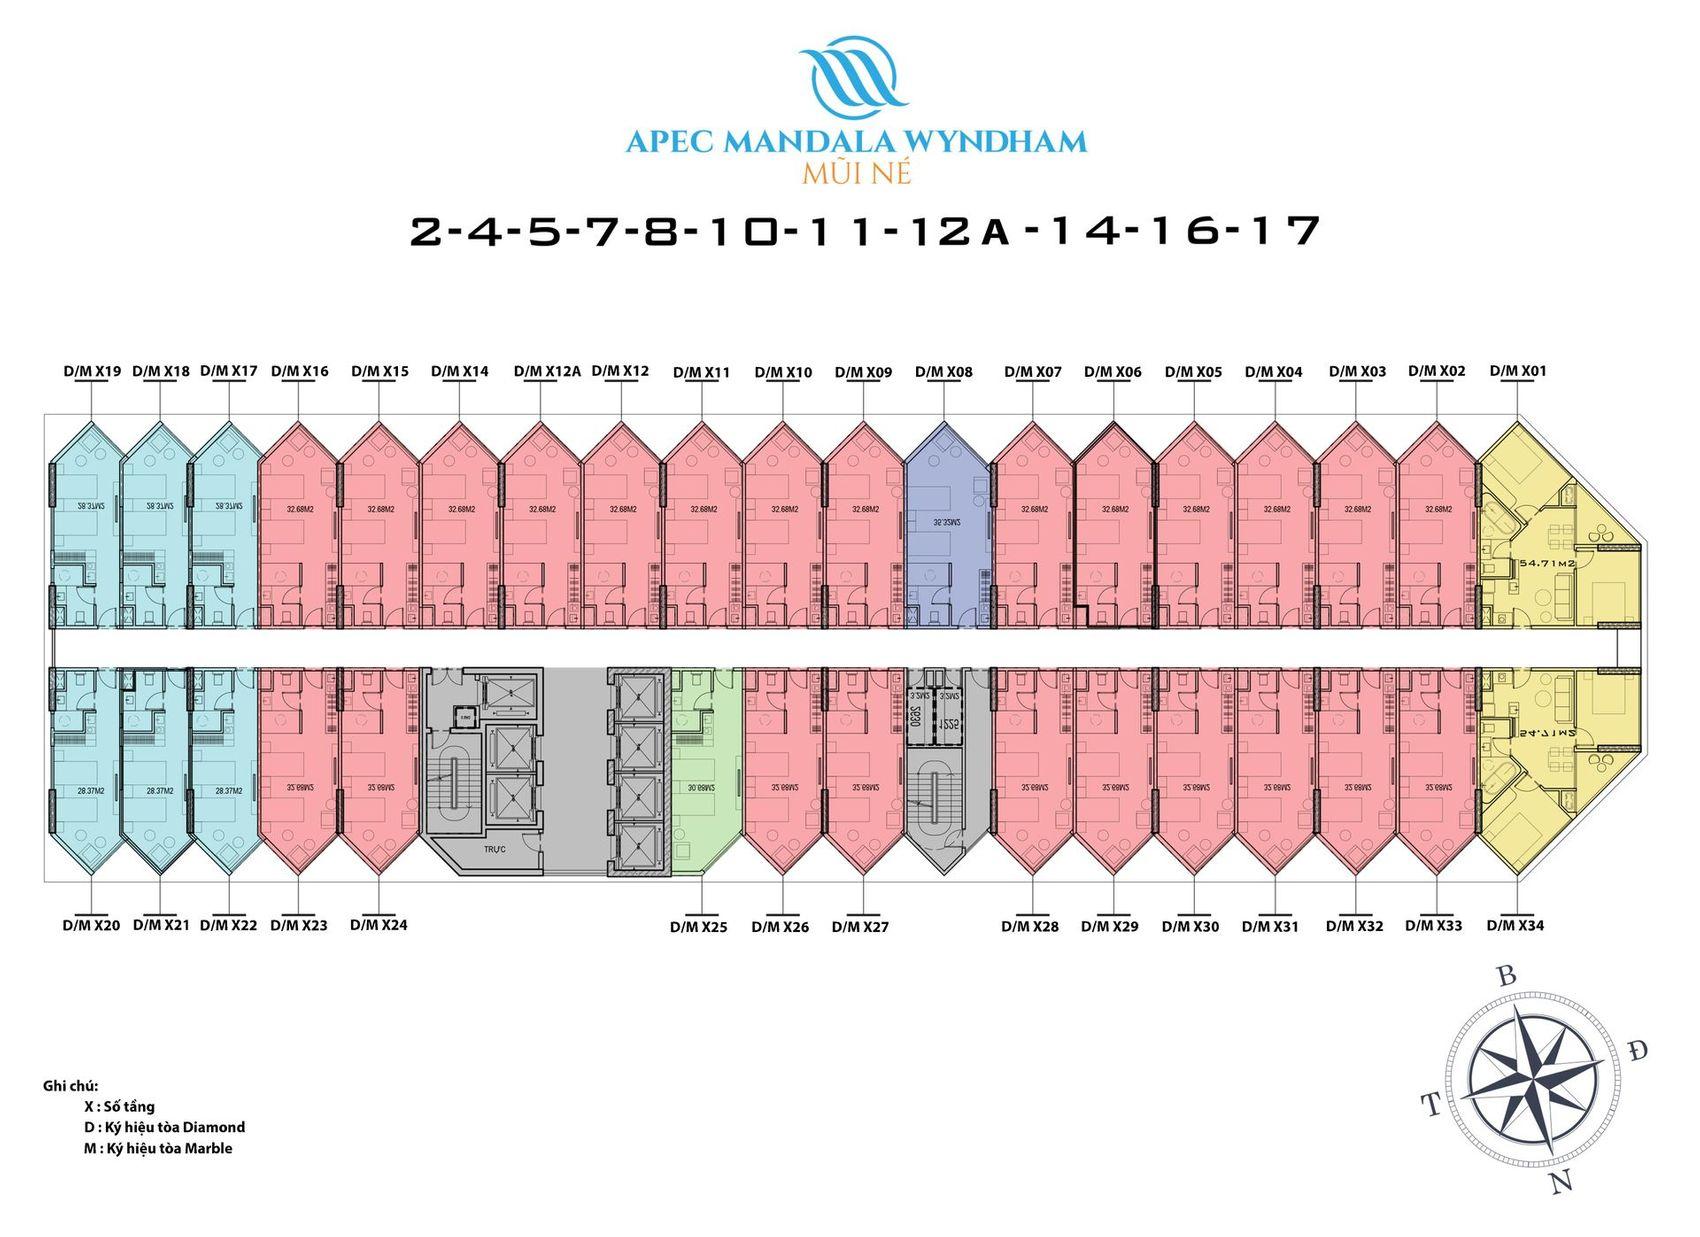 thiết kế Apec Mandala Wyndham Mũi Né